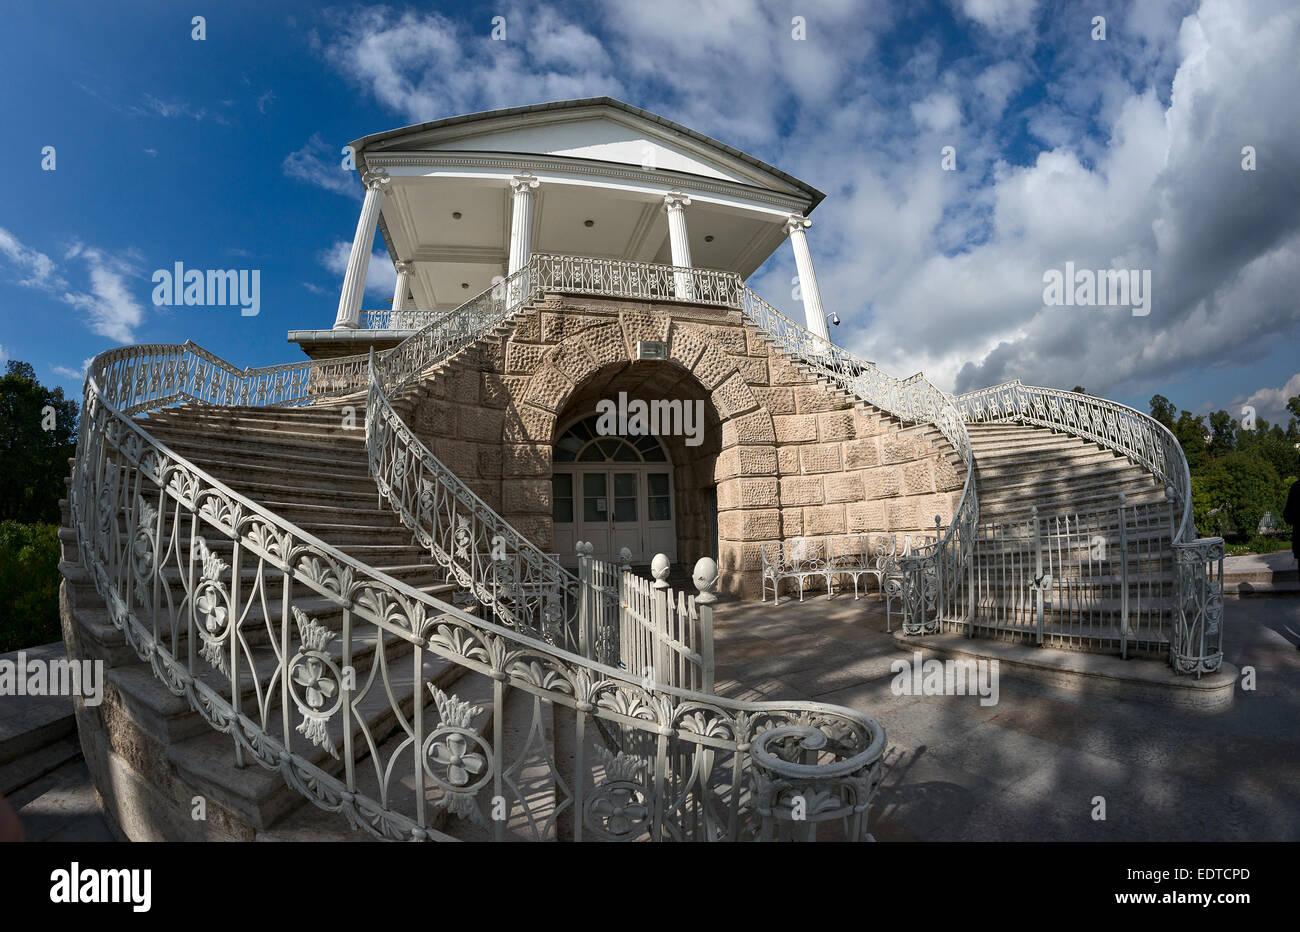 Cameron gallery in Tsarskoye Selo, Russia - Stock Image